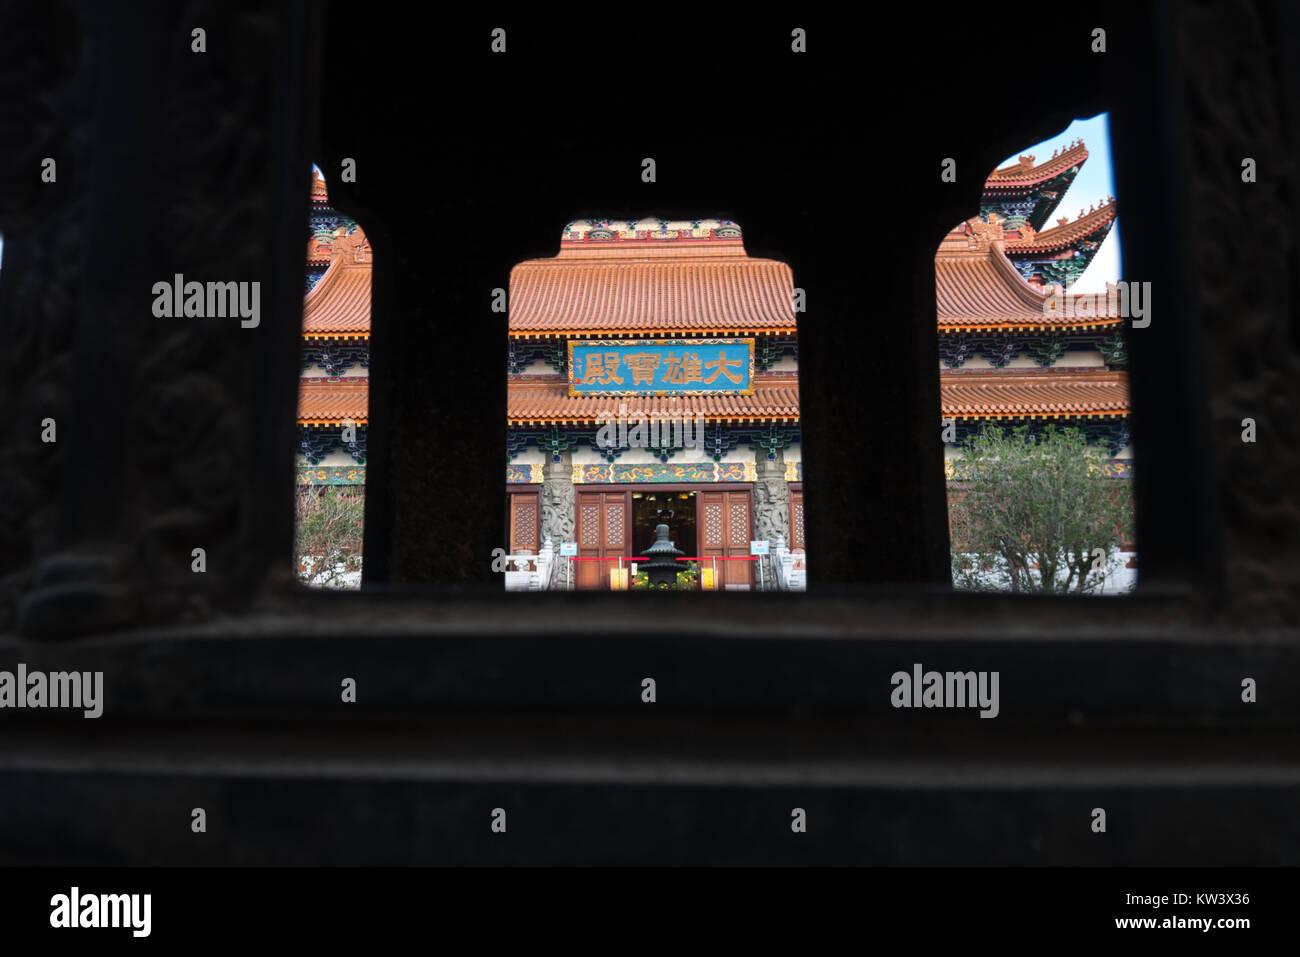 hong kong pol lin monastery in lantau island near ngoing ping - Stock Image